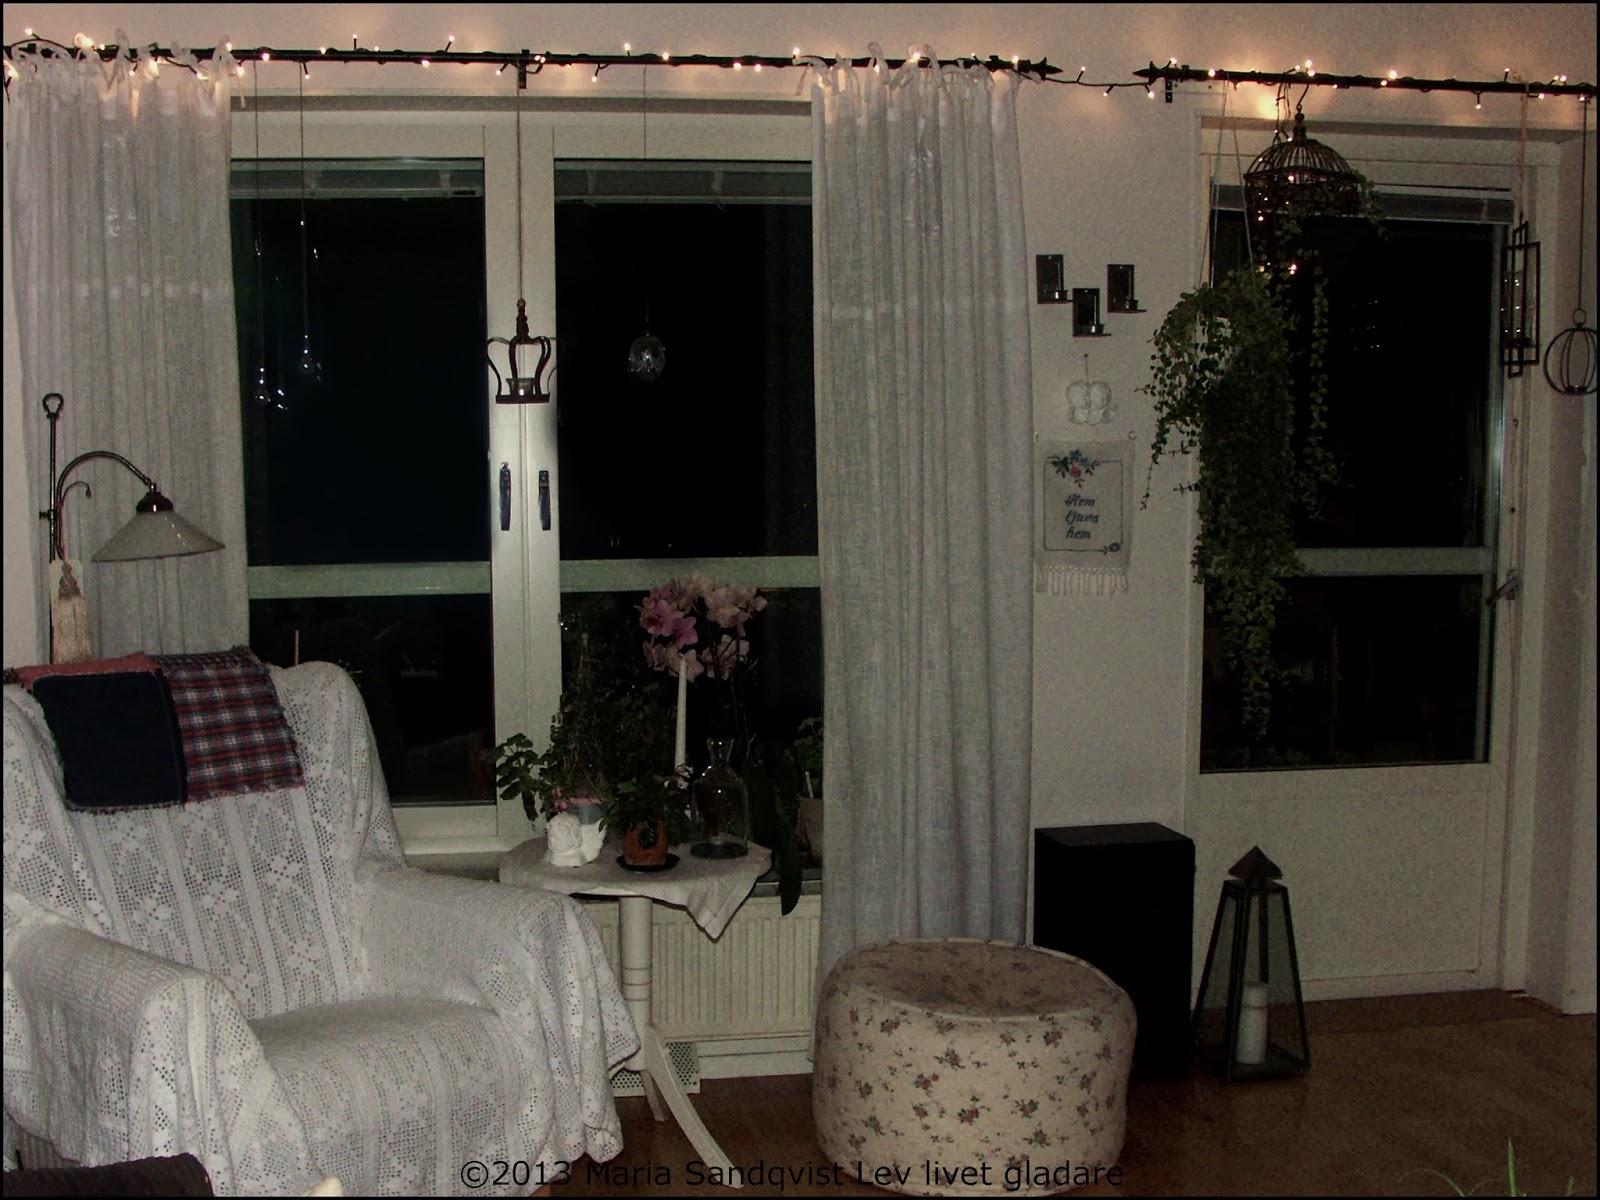 Lev livet gladare: mysbelysning i vardagsrummet